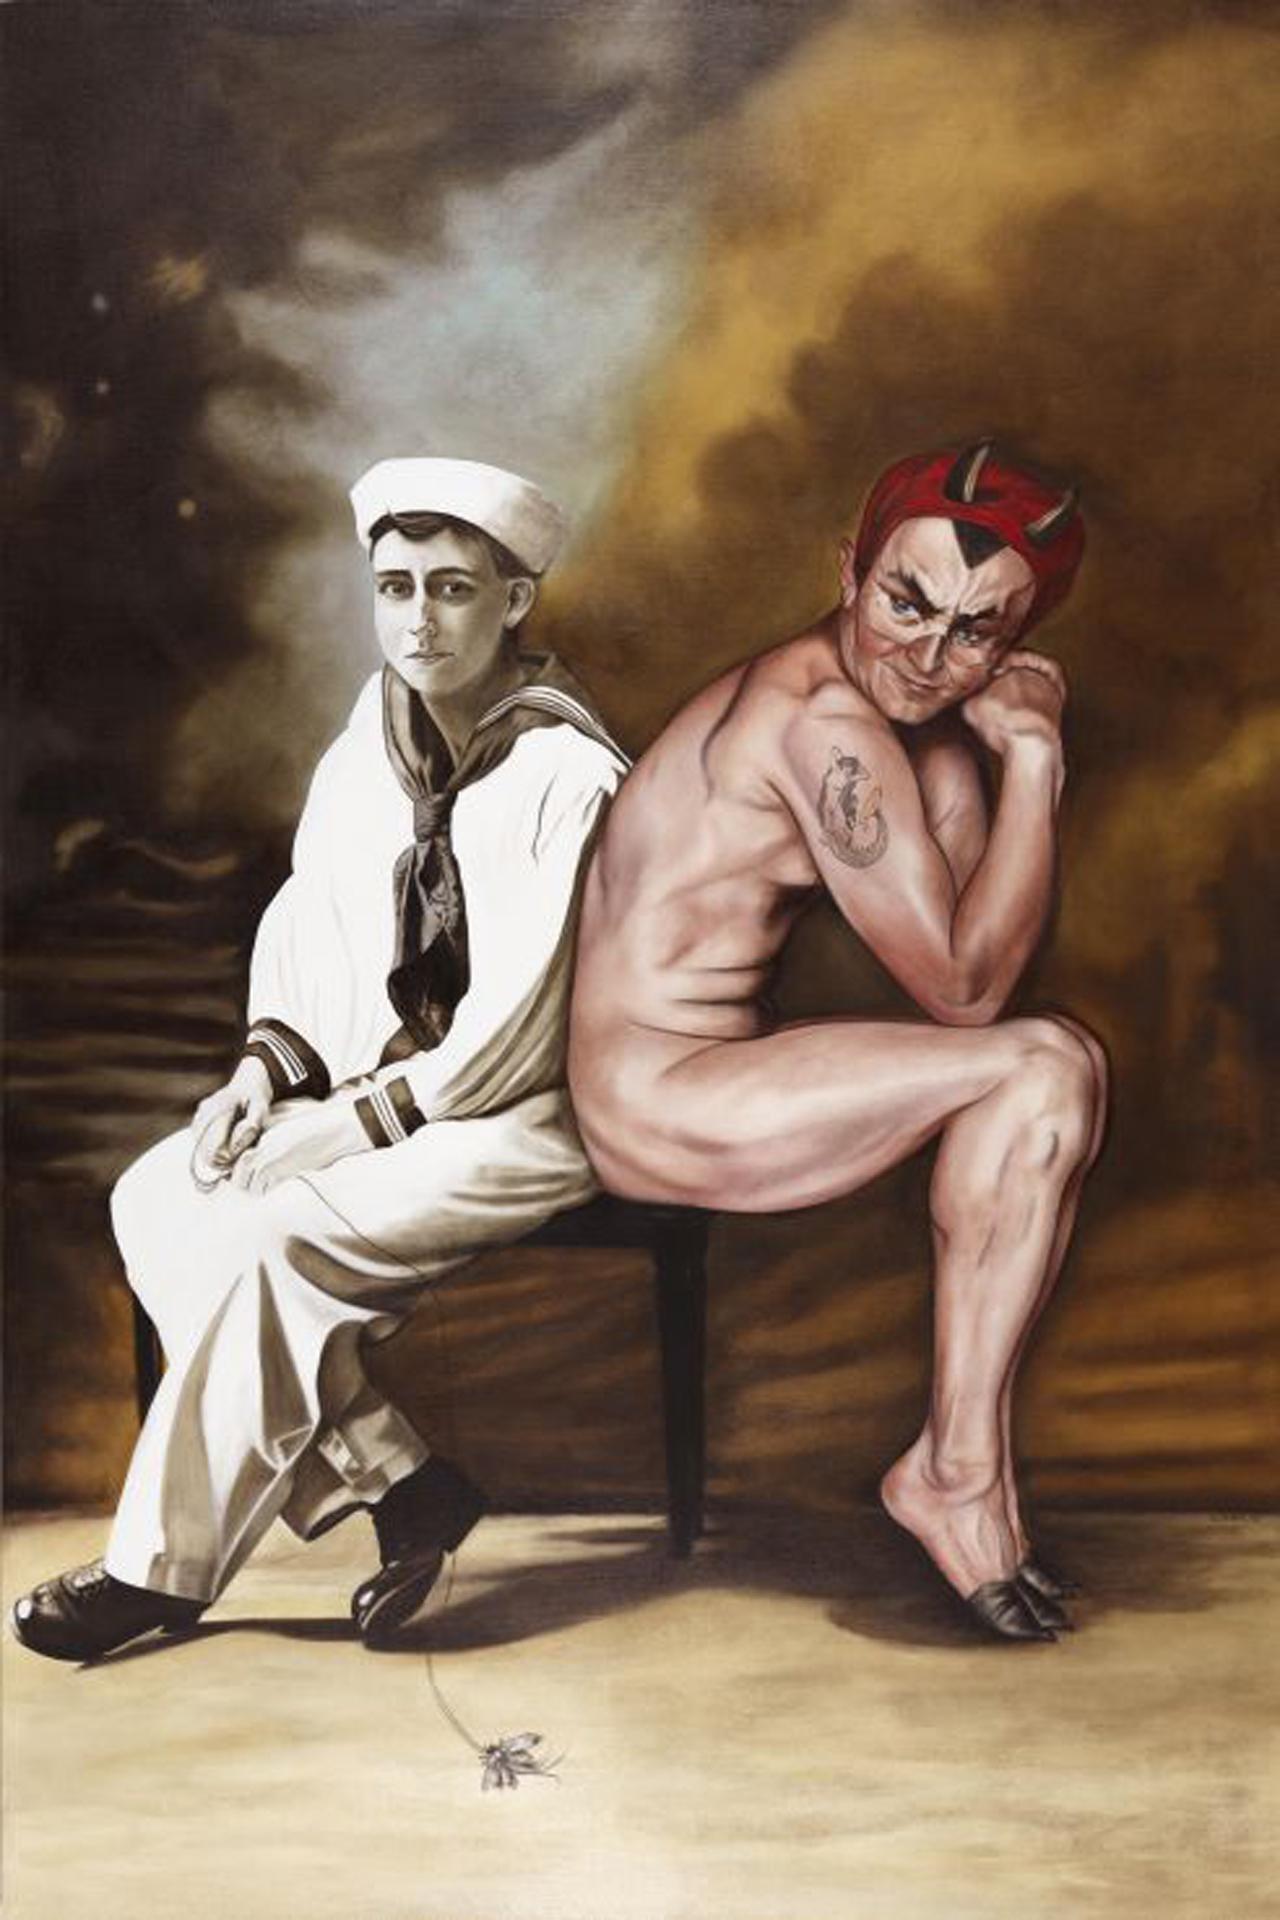 Marianna Gartner, Seated Sailor and Devil, 2008, Öl auf Leinwand, 183 x 122 cm